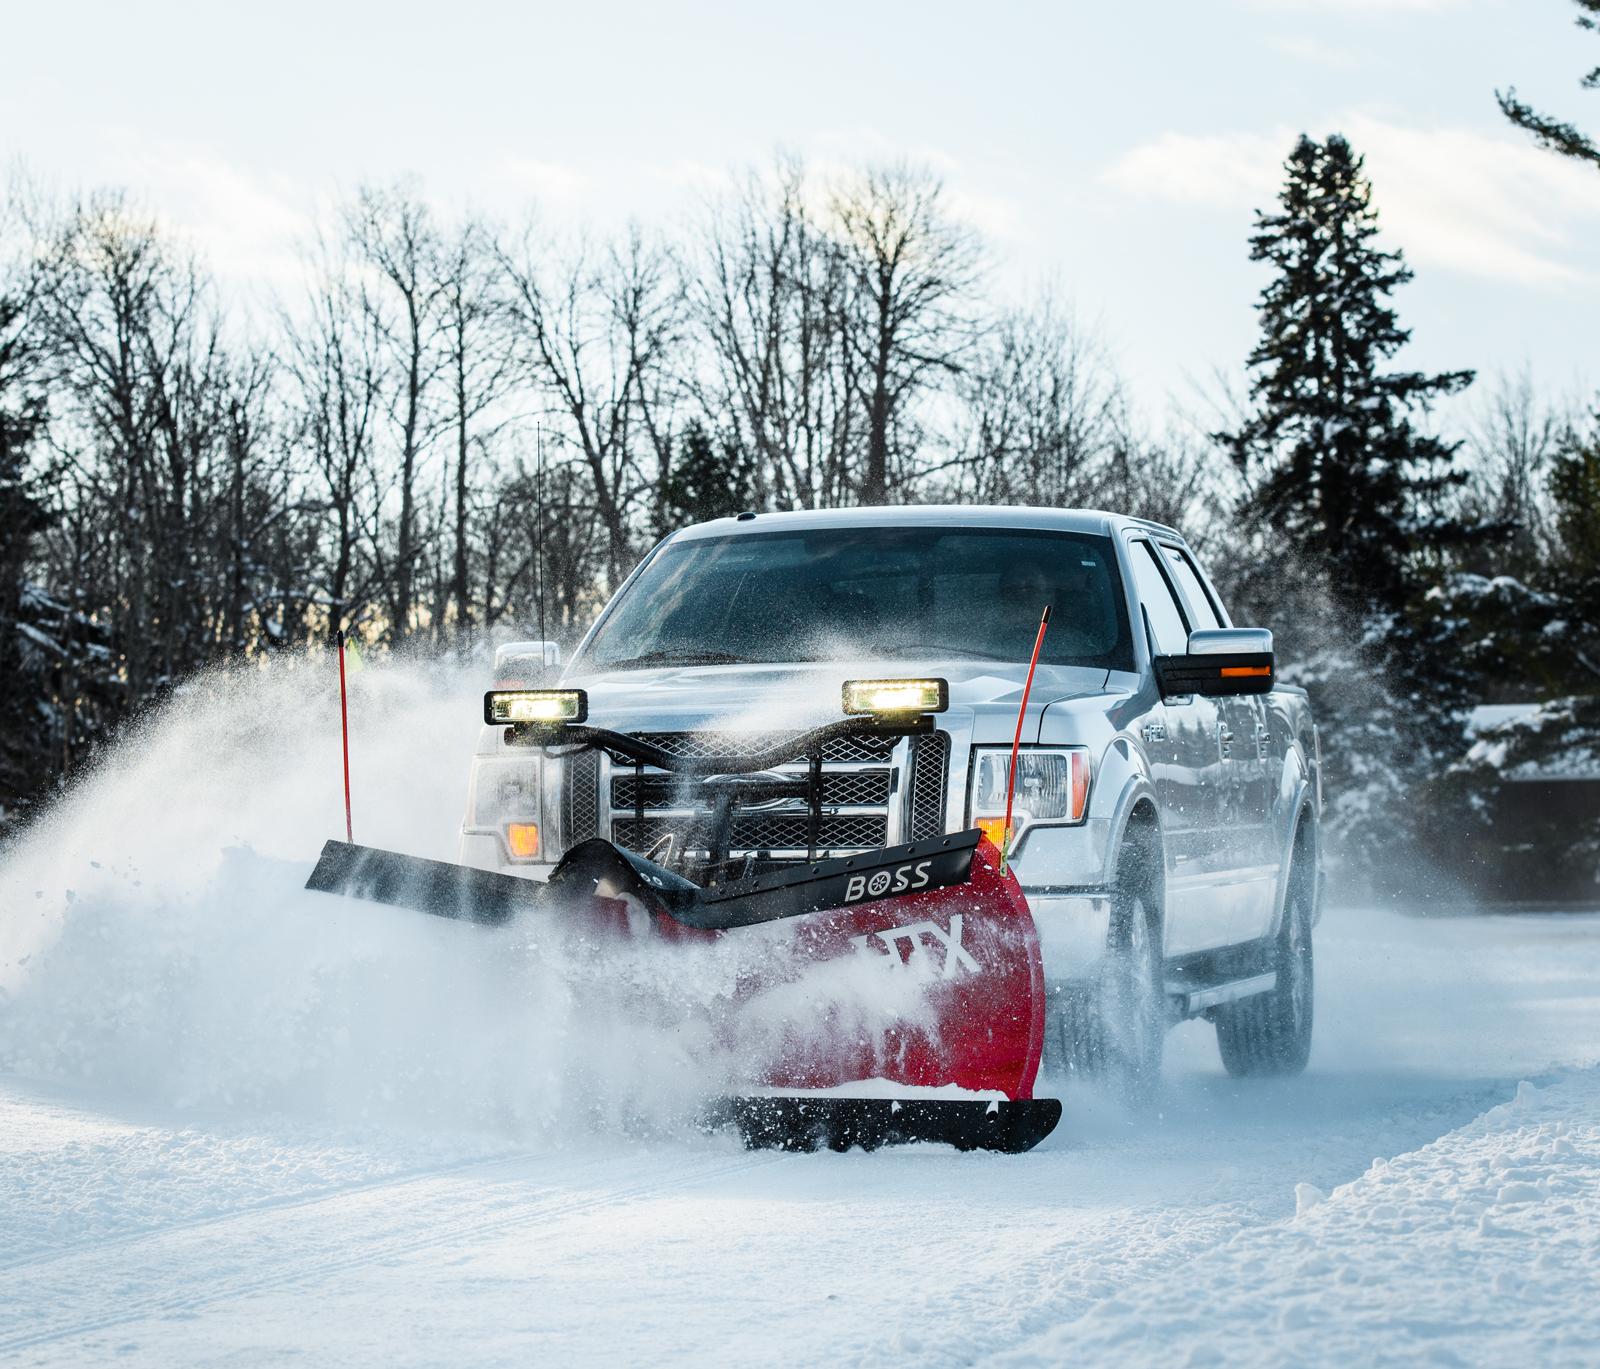 boss snow plows citroen c4 boot wiring diagram snowplow truck plow equipment